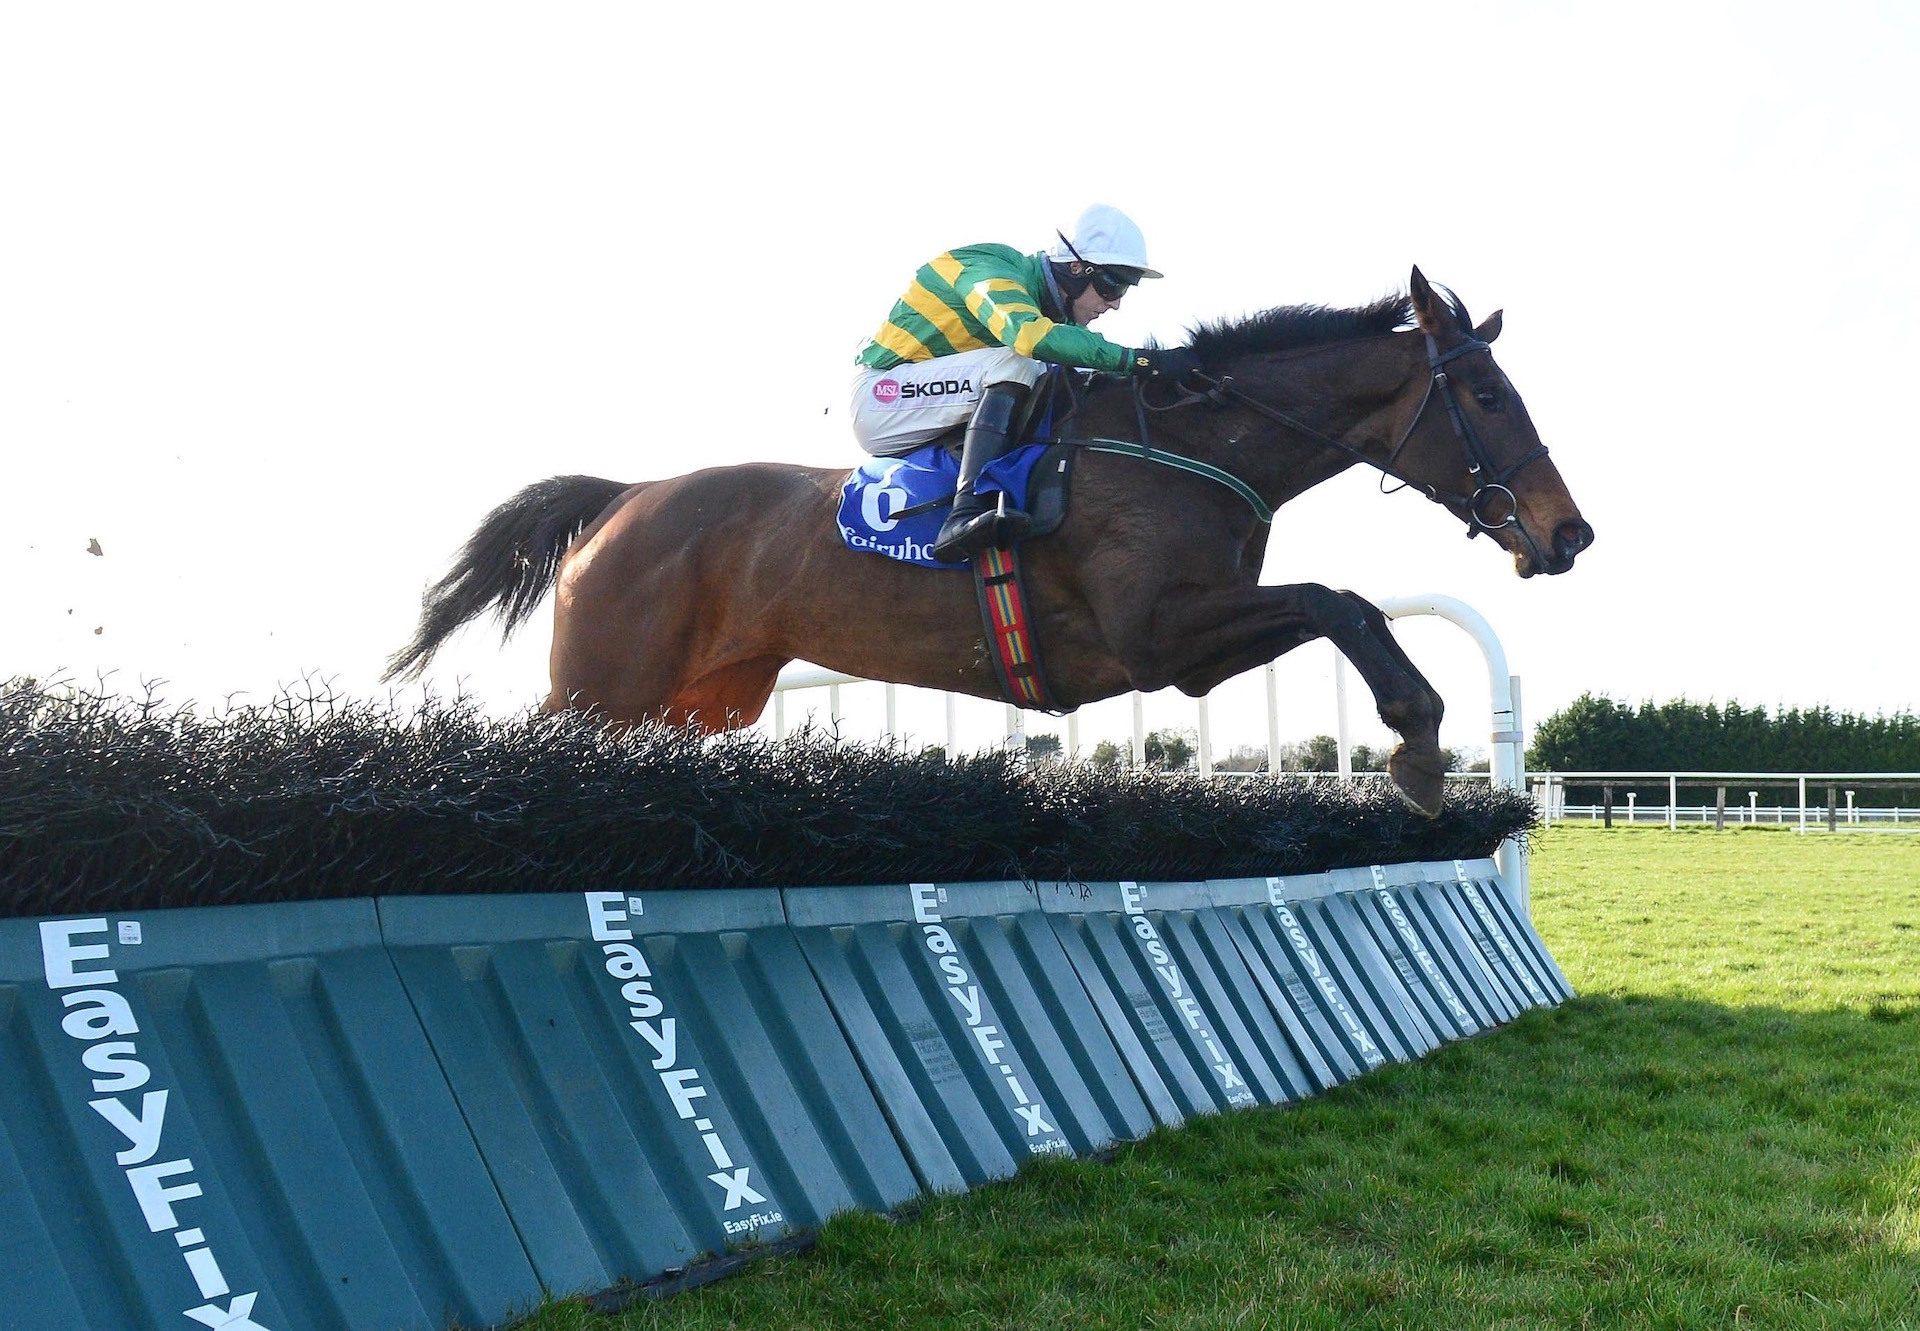 Norwigi (Yeats) Wins The Mares Maiden Hurdle At Fairyhouse